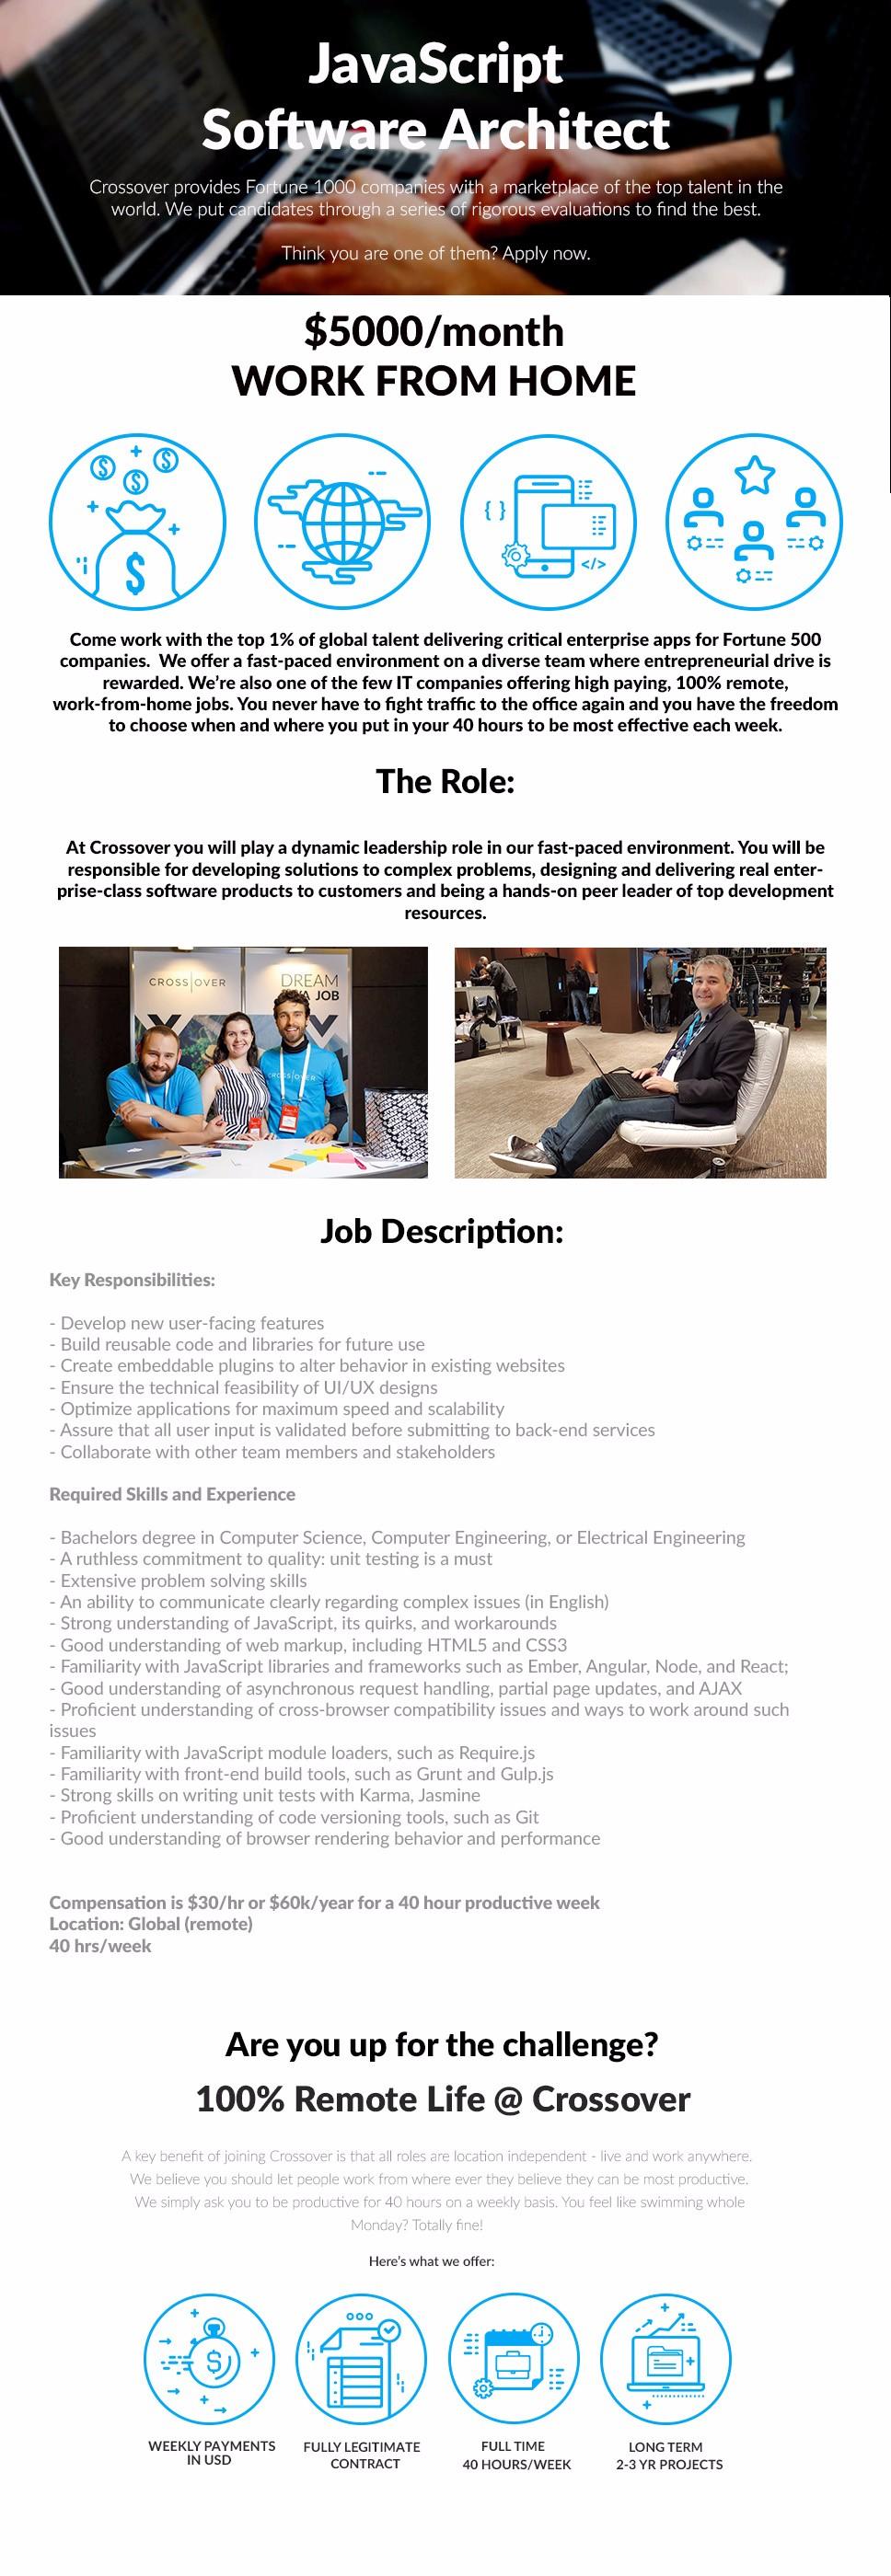 2224 - JavaScript Software Architect, JAVA, Java Script, HTML, HTML5, CSS3,